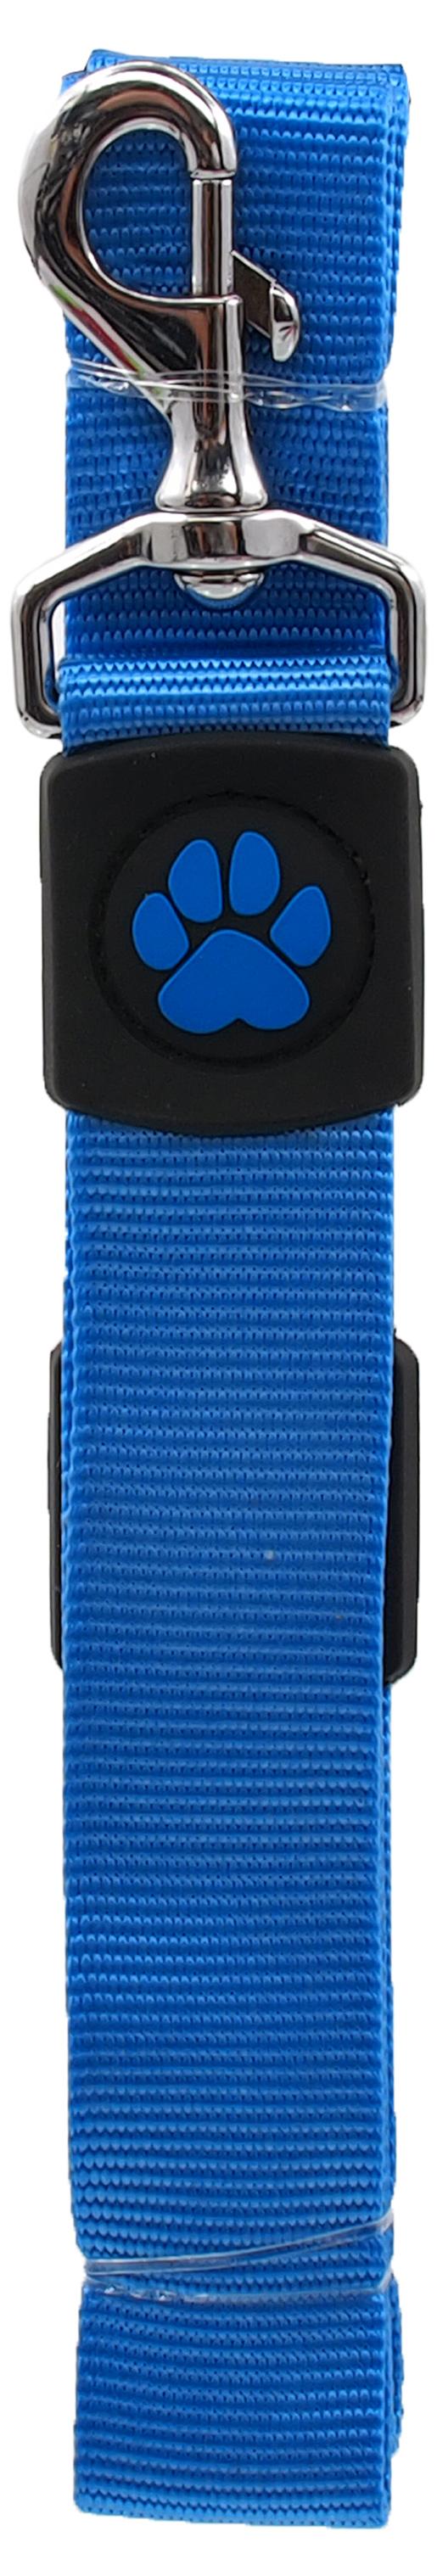 Dog Fantasy Vodítko Active Dog Premium XL modré 3,8x120cm